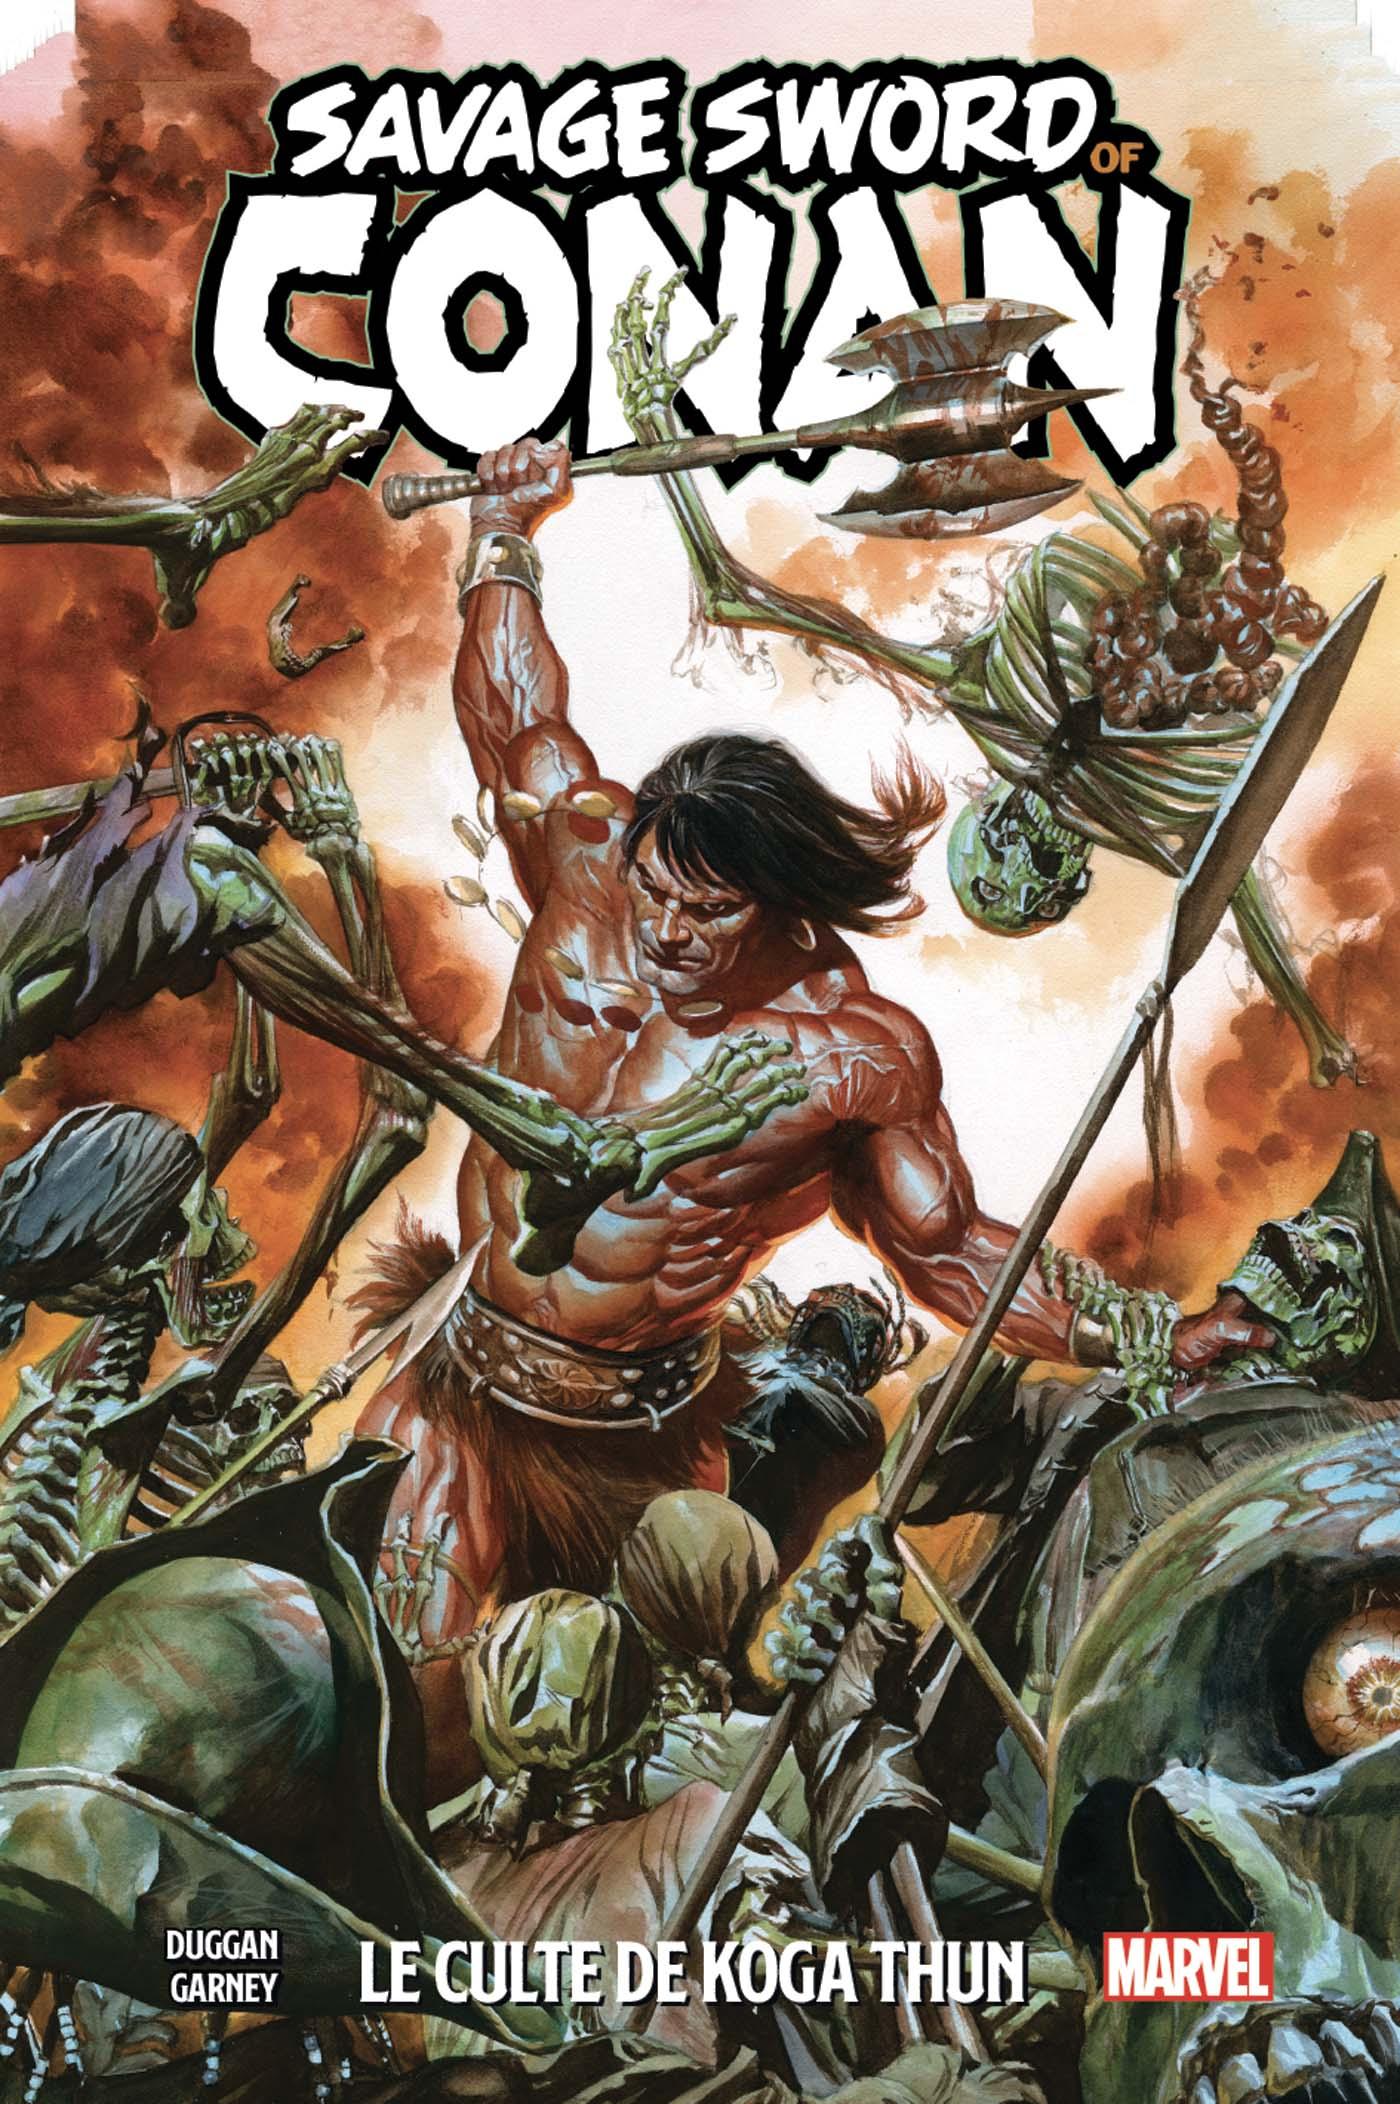 THE SAVAGE SWORD OF CONAN TOME 1 (VF)